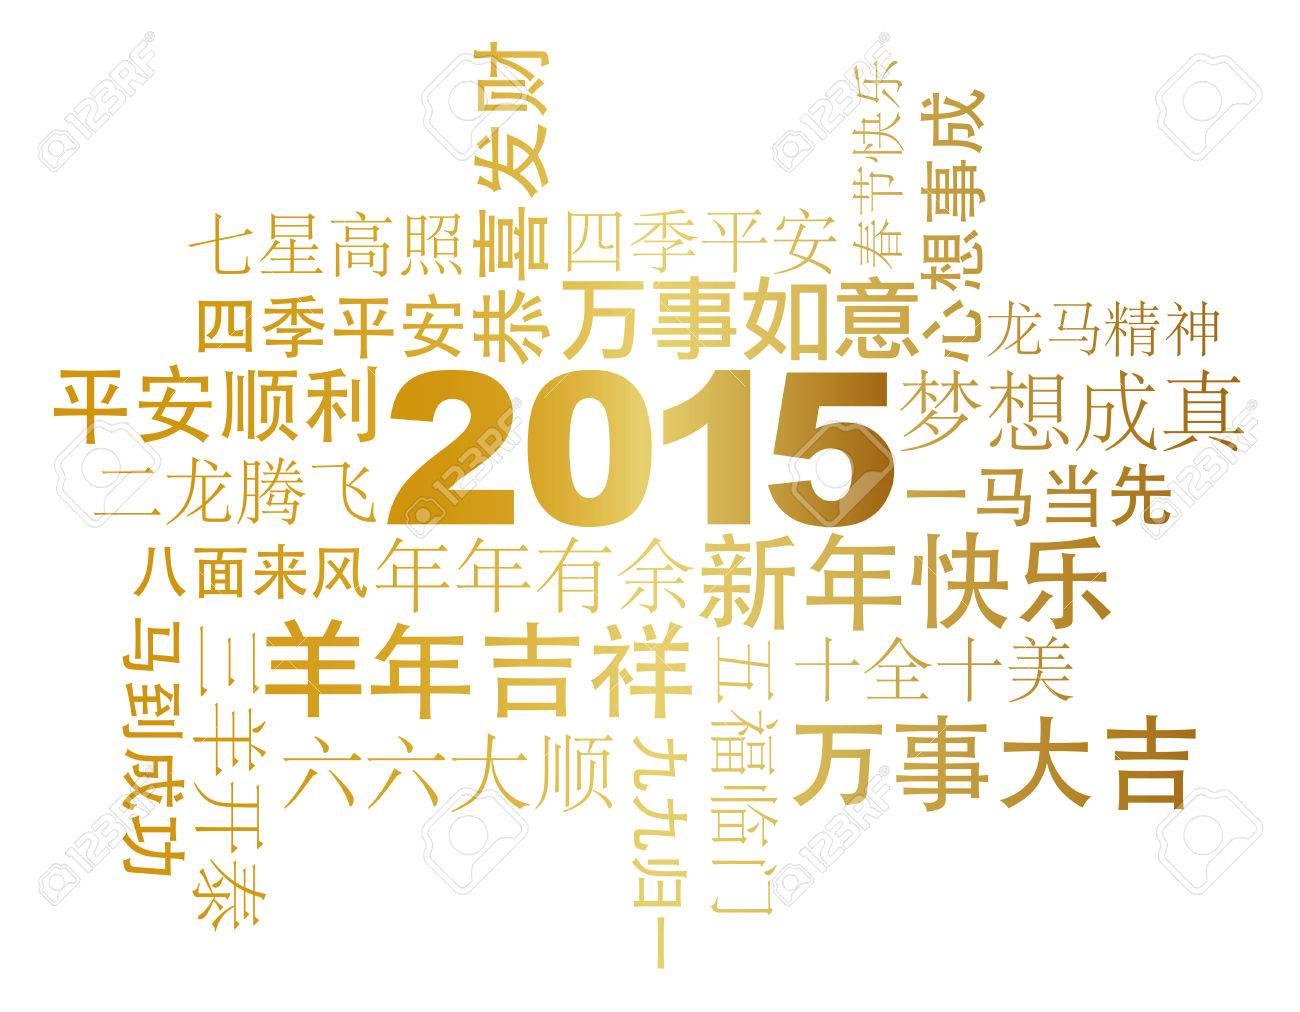 2015 Chinese Lunar New Year Grüße Text Wünschen Gesundheit Good ...